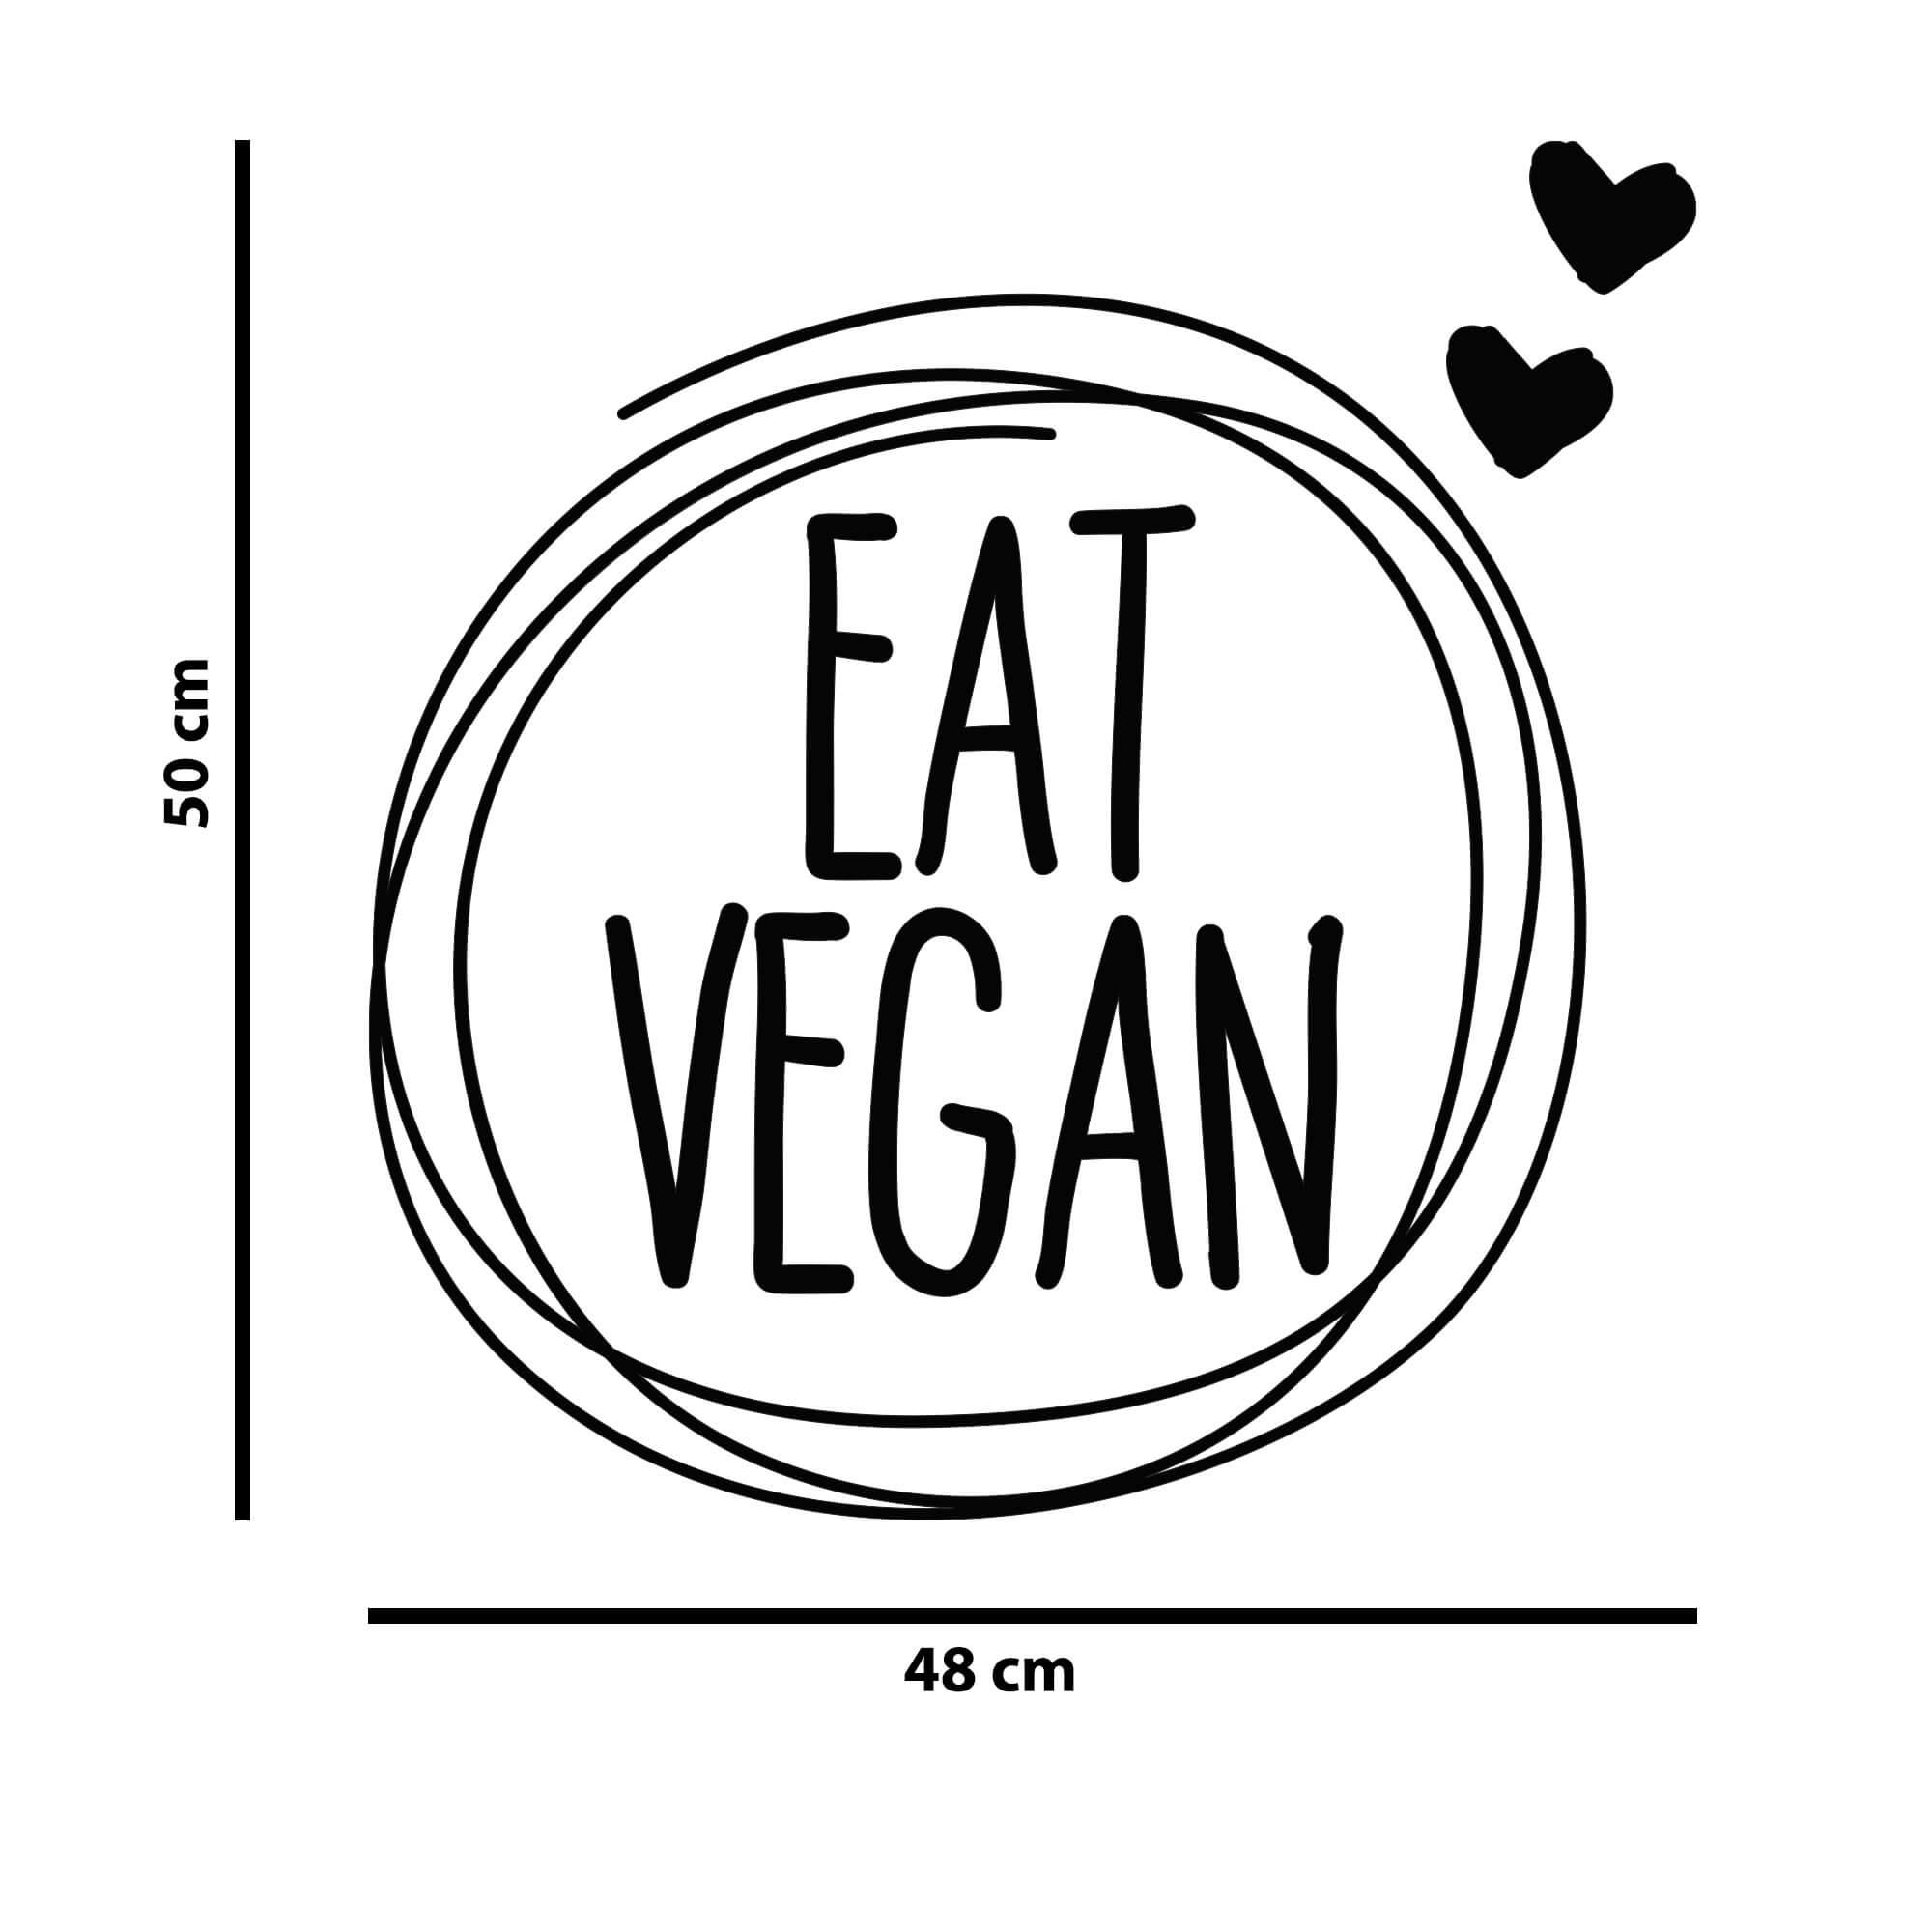 Adesivo Decorativo de Parede Eat Vegan